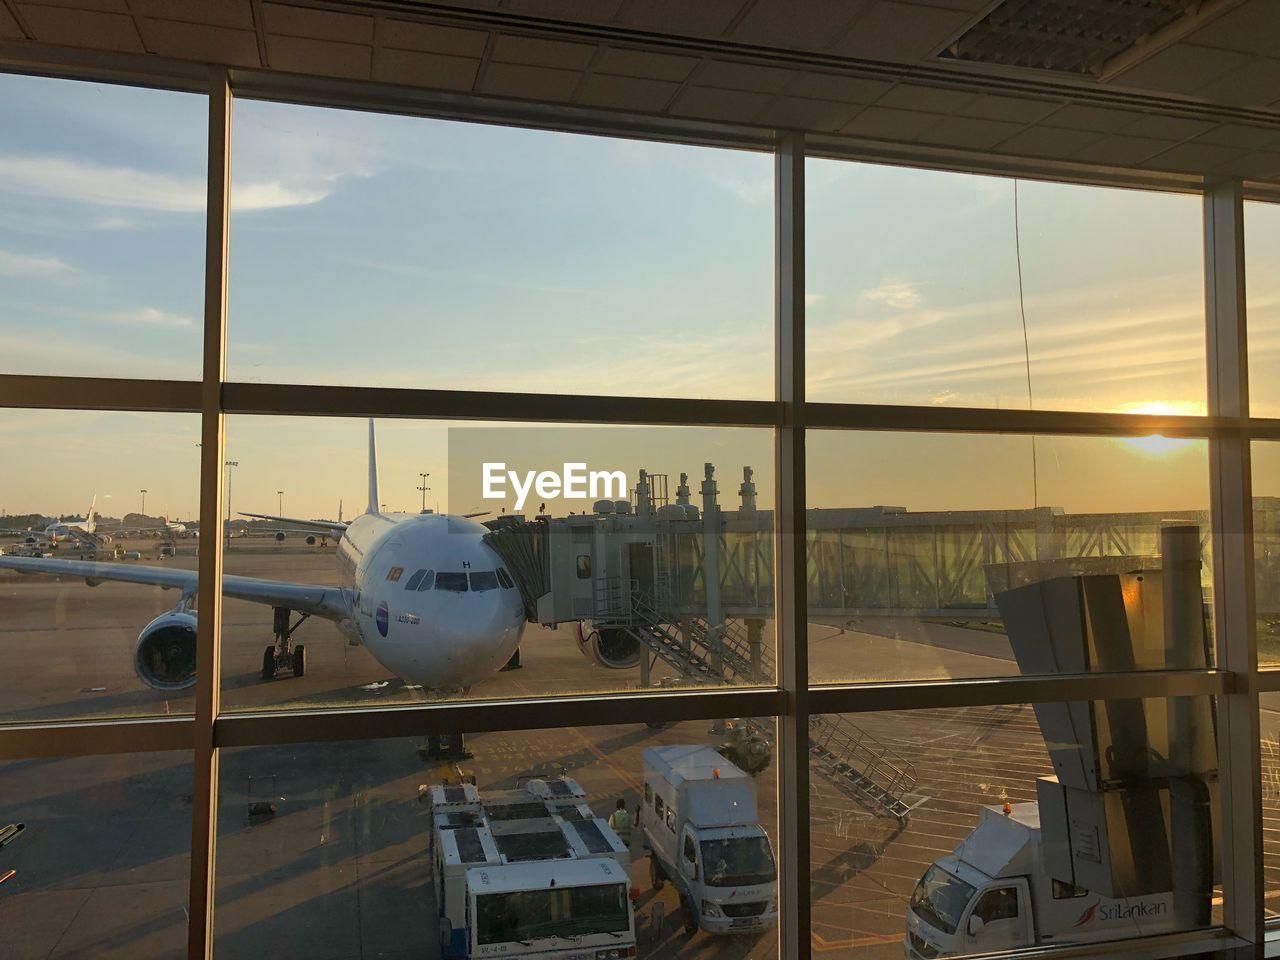 AIRPLANE SEEN THROUGH WINDOW AT SUNSET